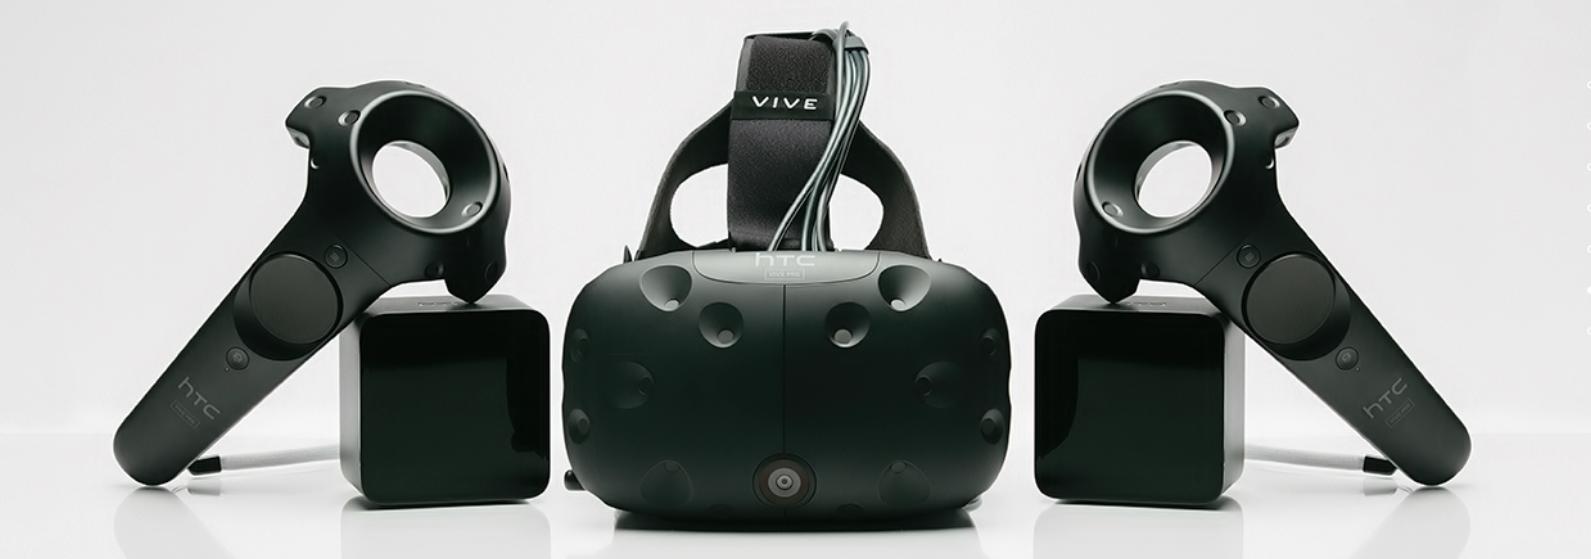 HTC_Vive_VR_Headset